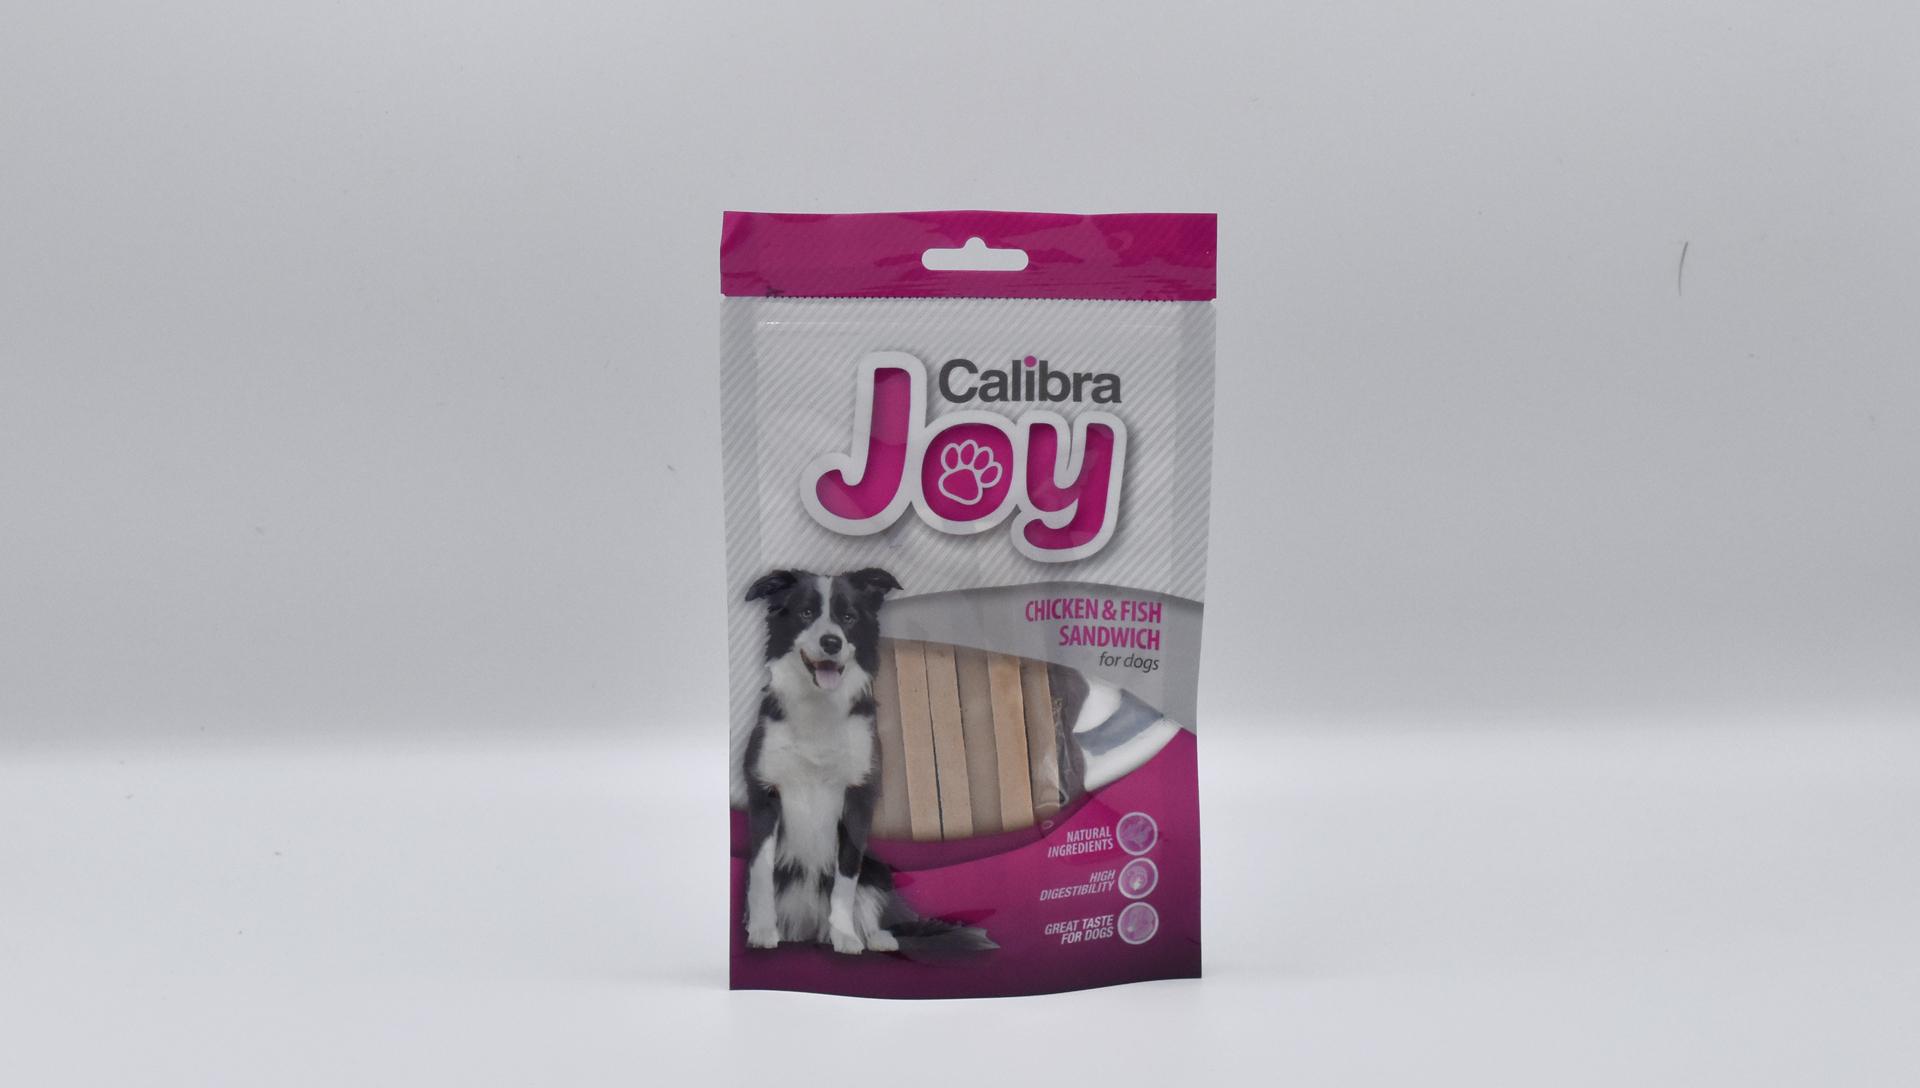 Calibra Joy